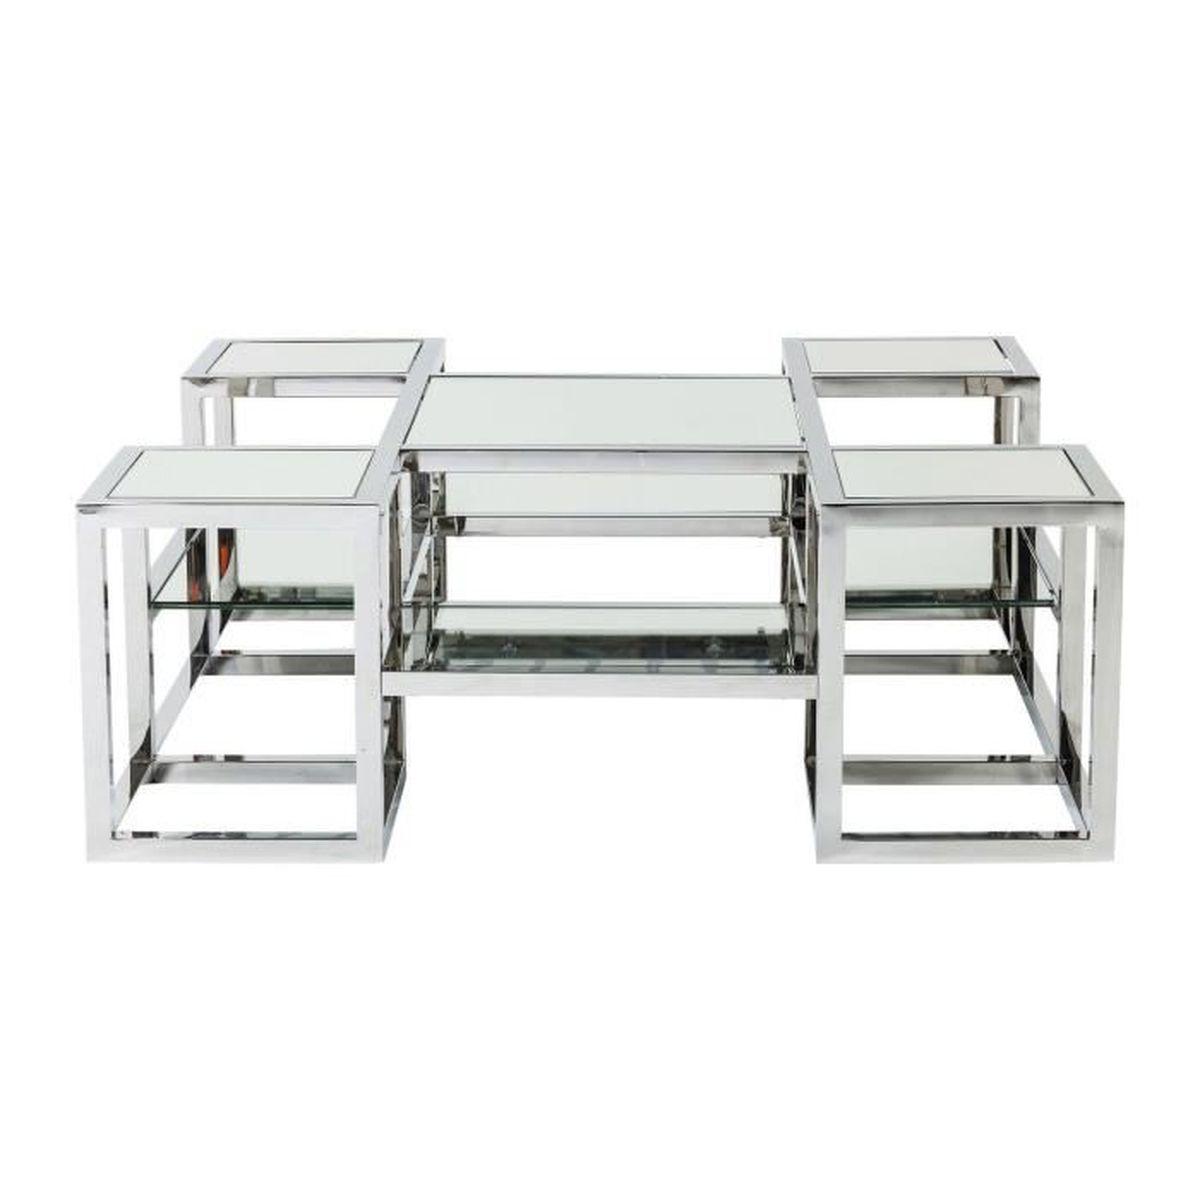 Table basse steps miroir 100x100 cm kare design achat for Miroir 100x100